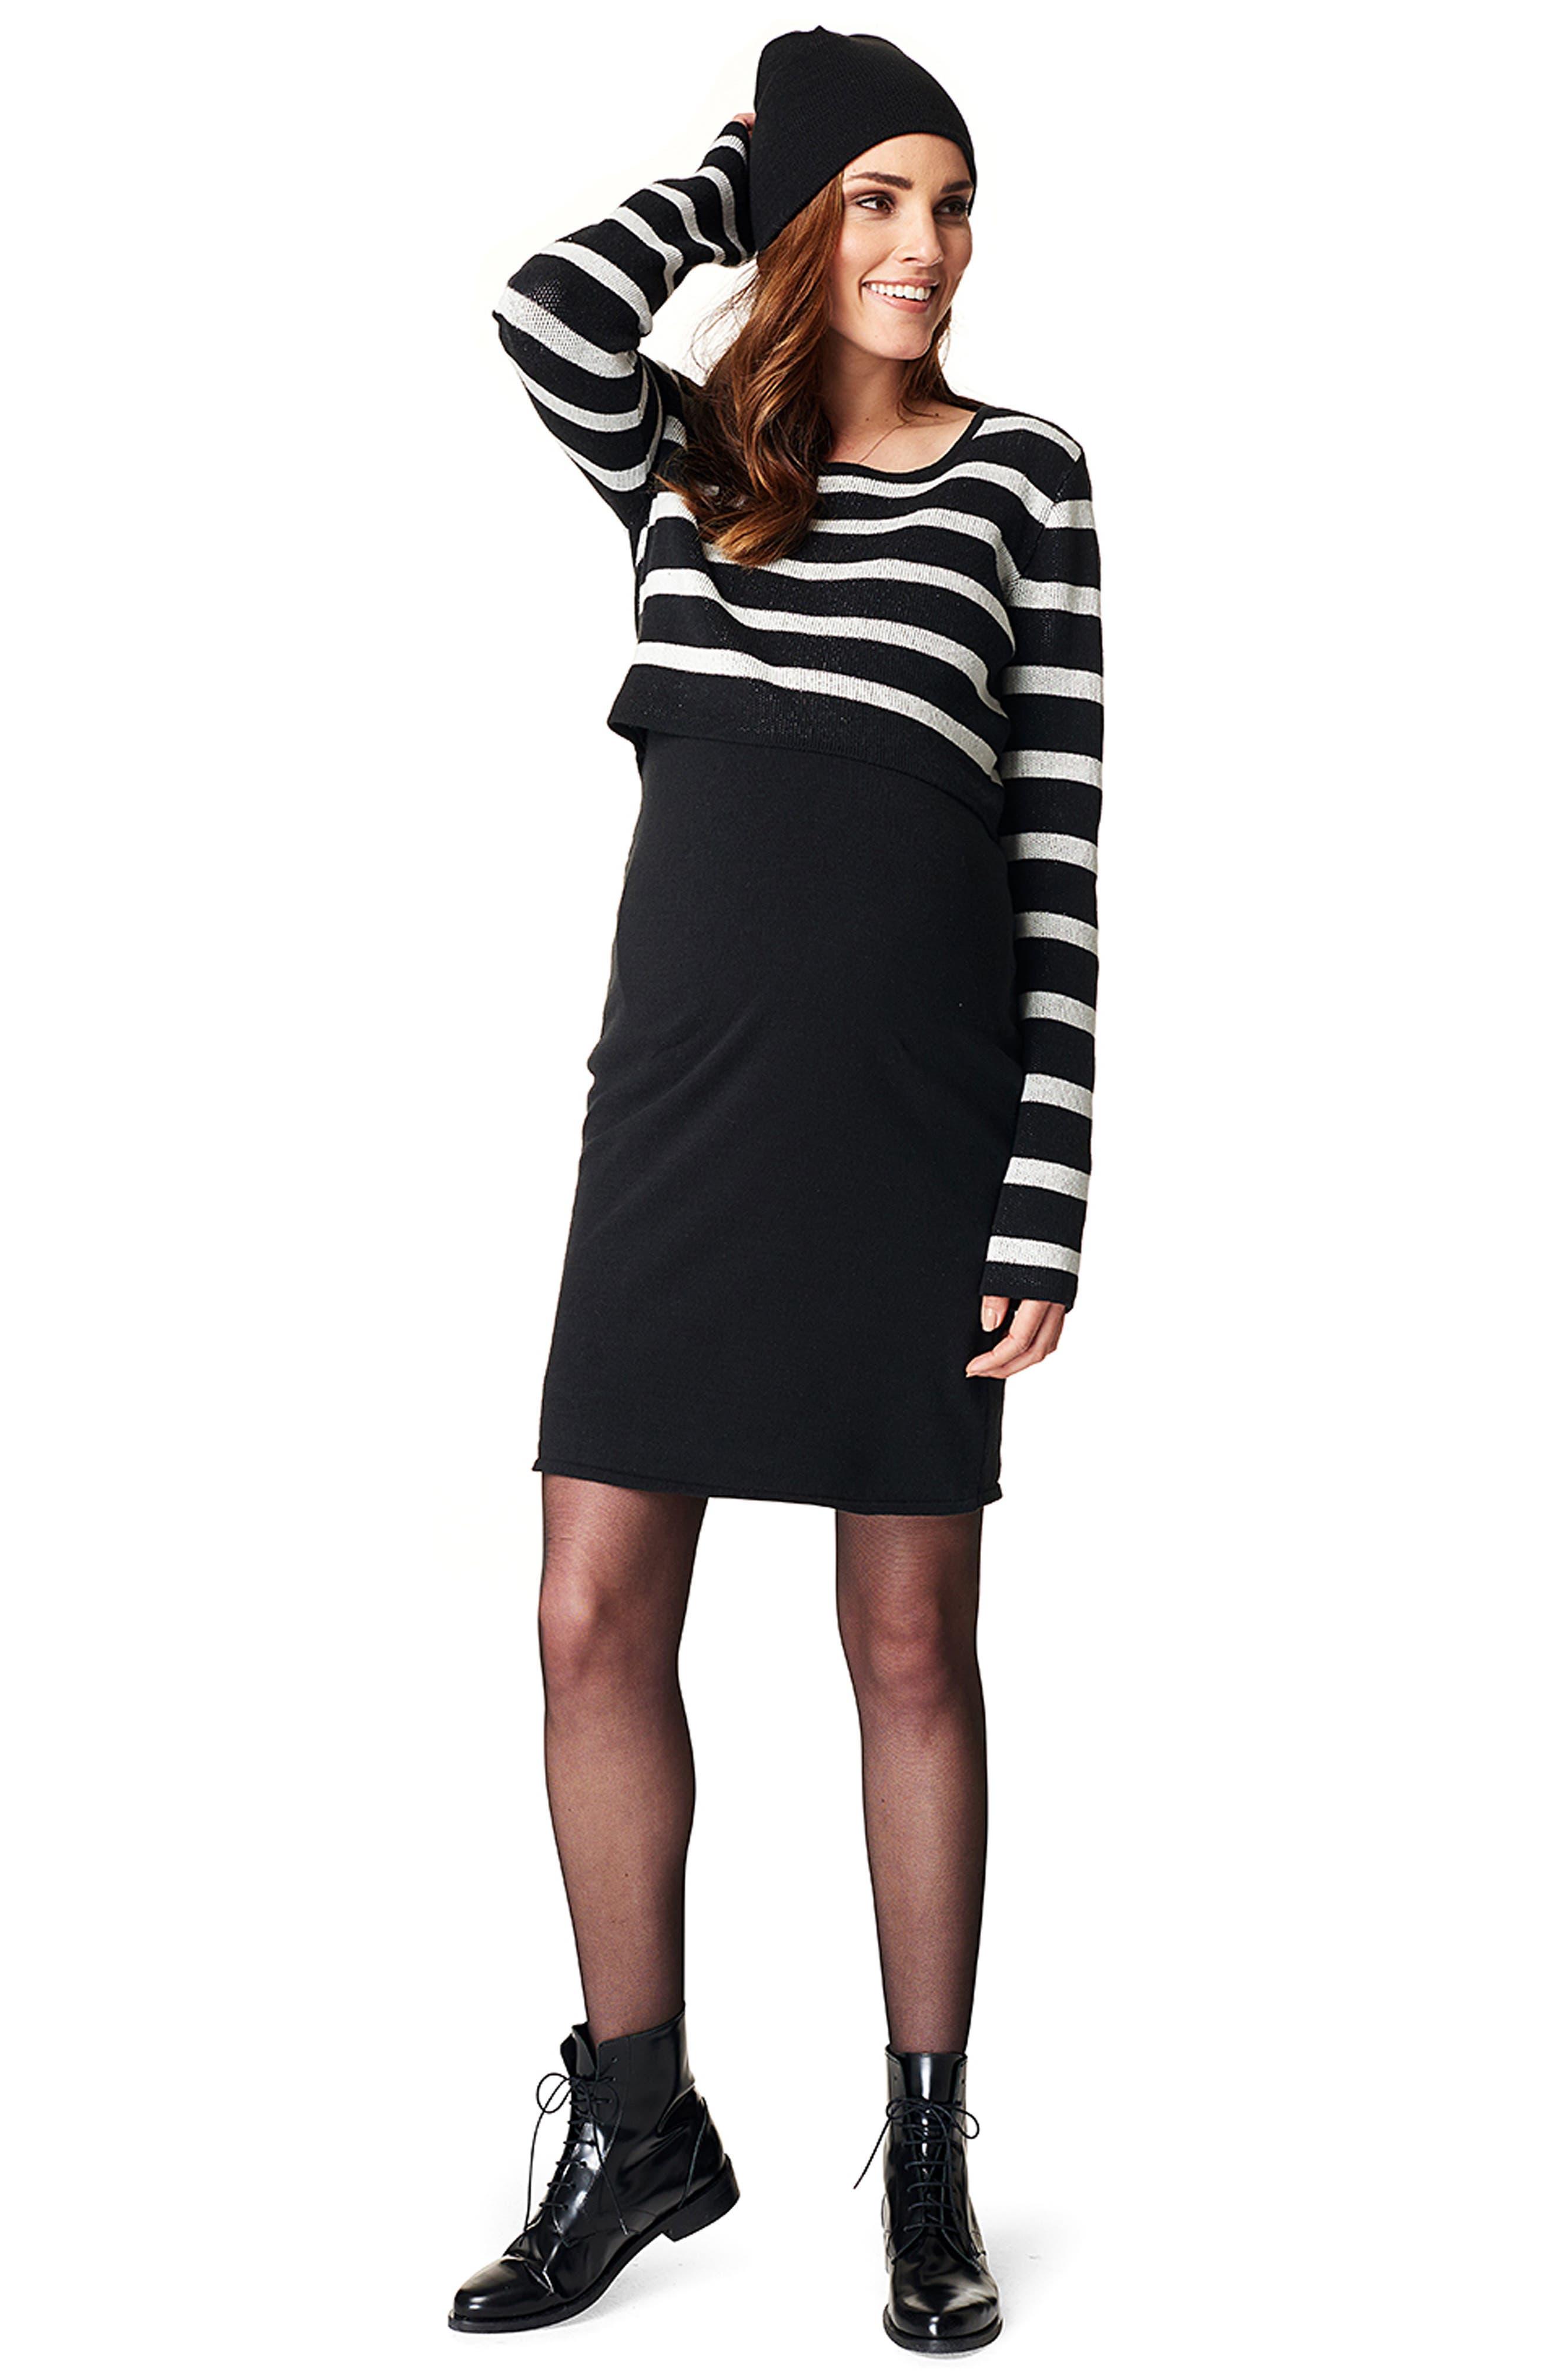 Imara Nursing/Maternity Dress,                             Alternate thumbnail 5, color,                             BLACK